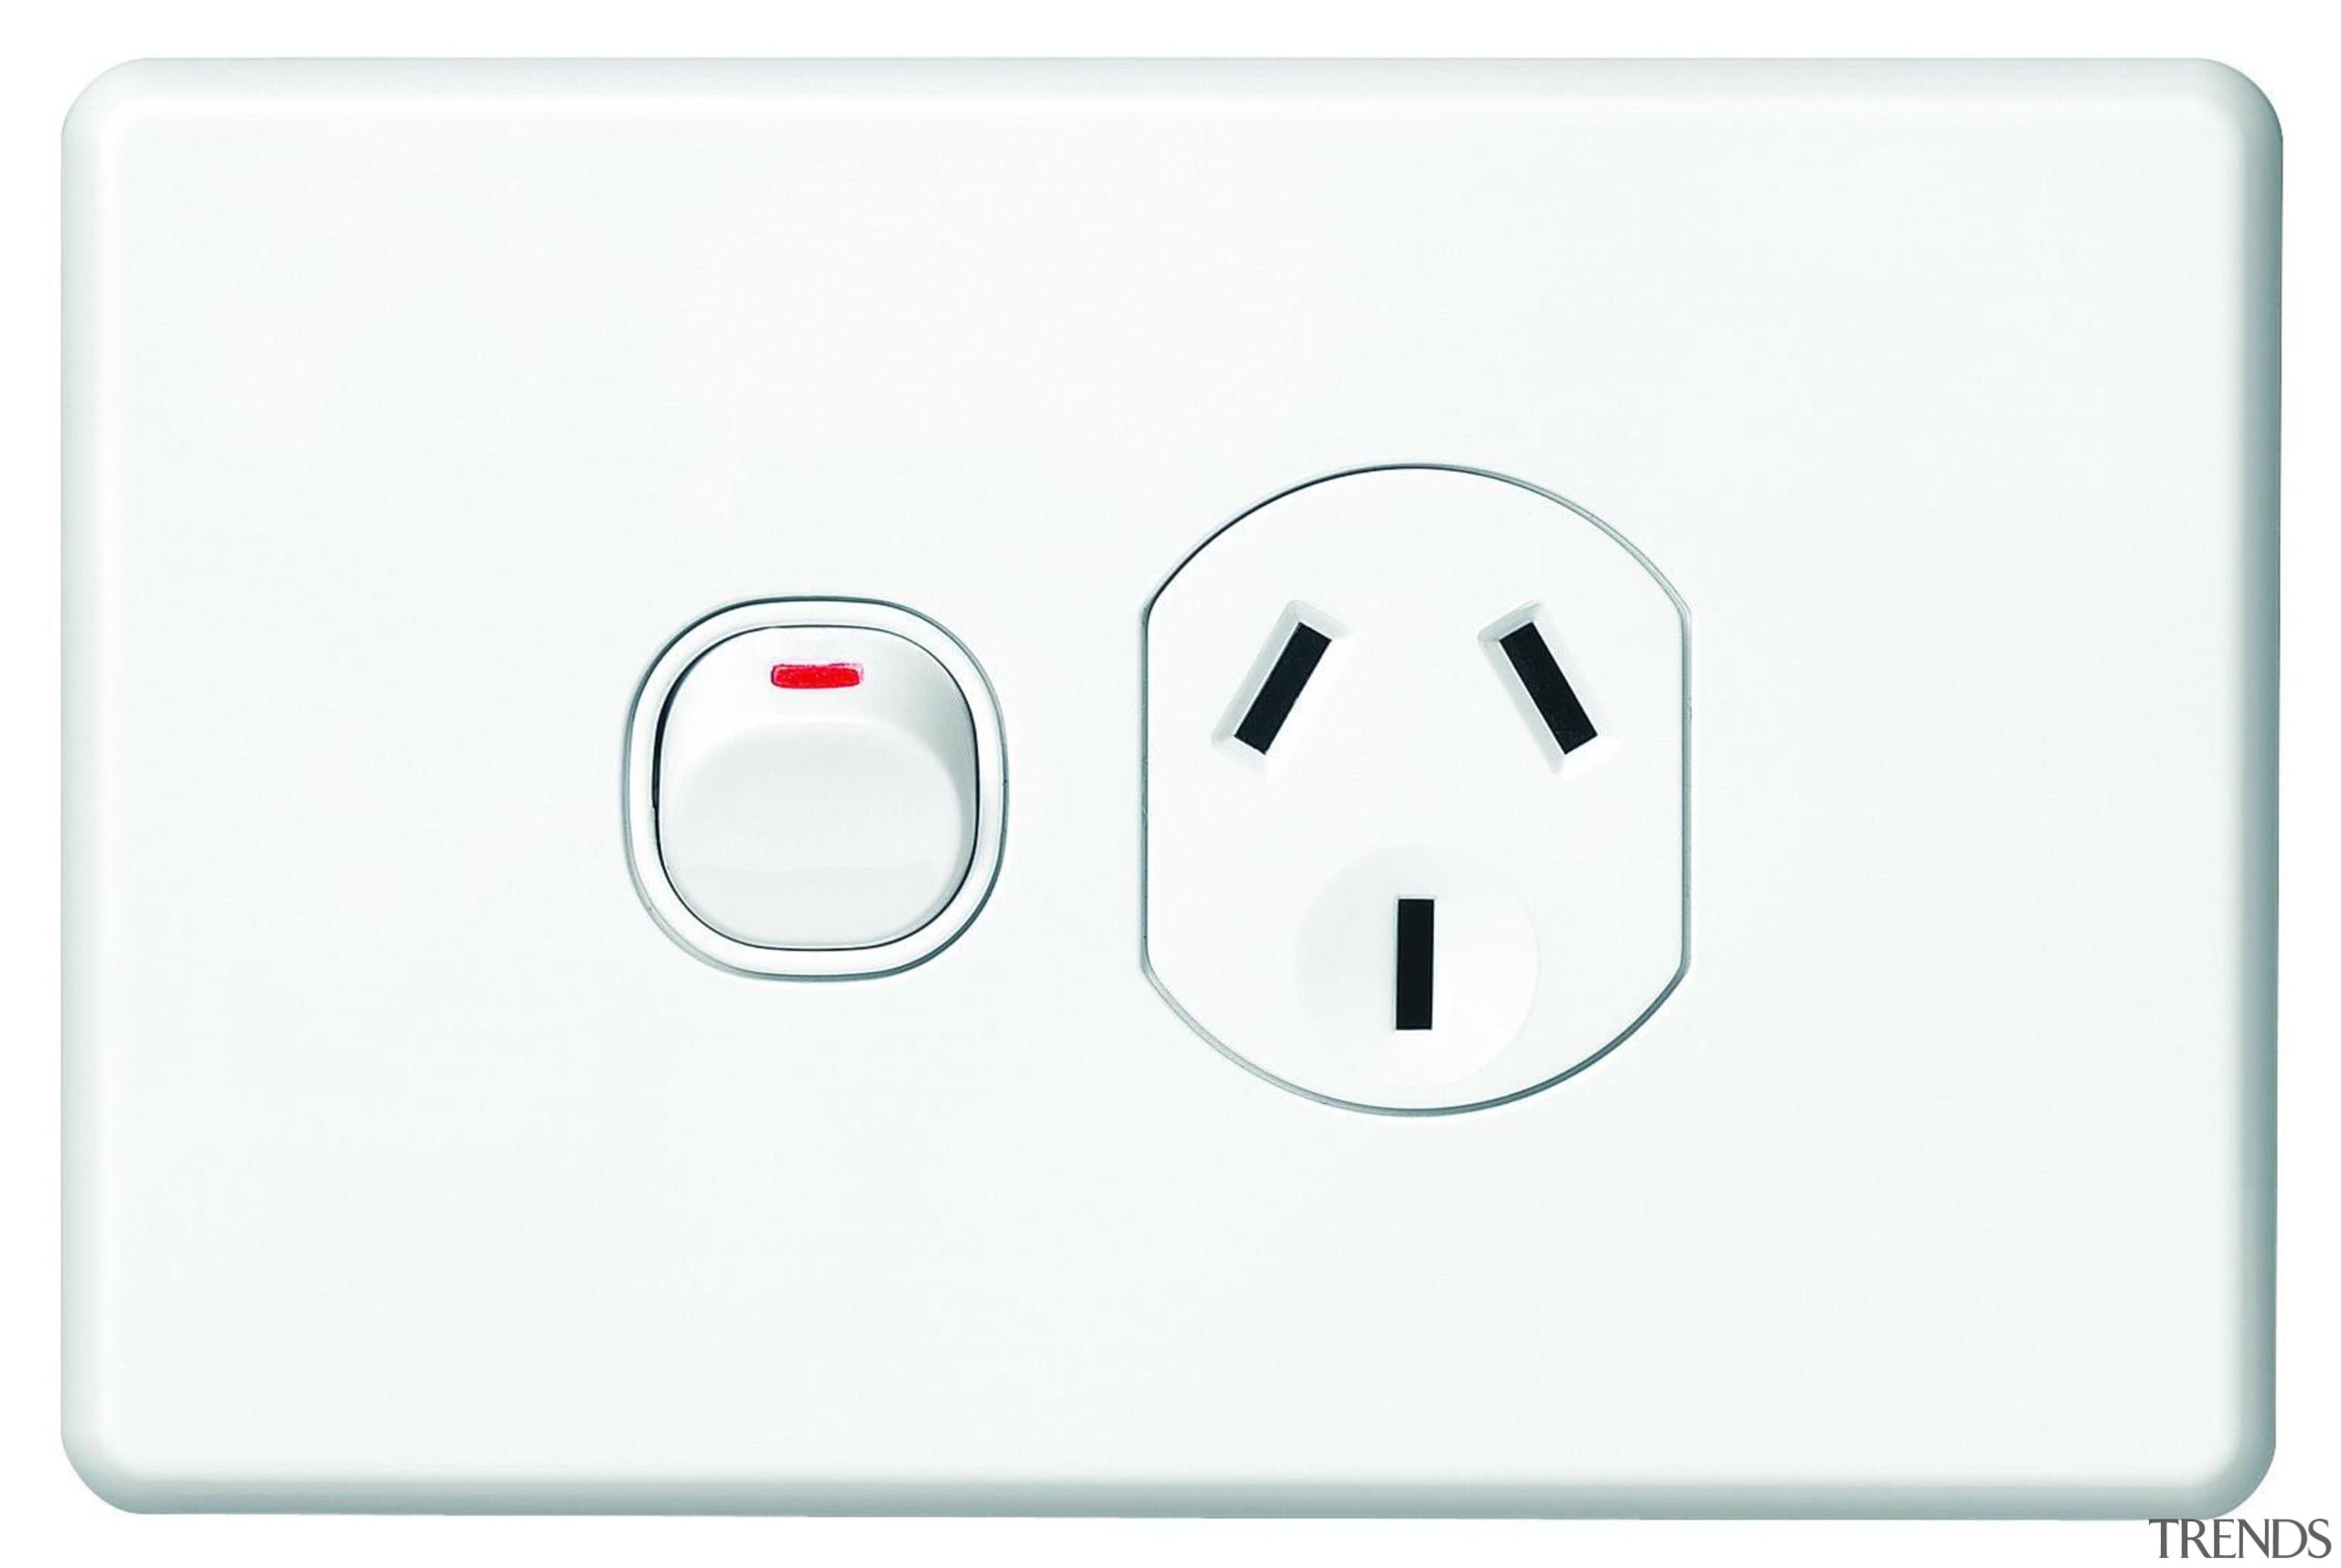 Slimline Series single horizontal socket White - SC2015 ac power plugs and socket outlets, electronic device, technology, white